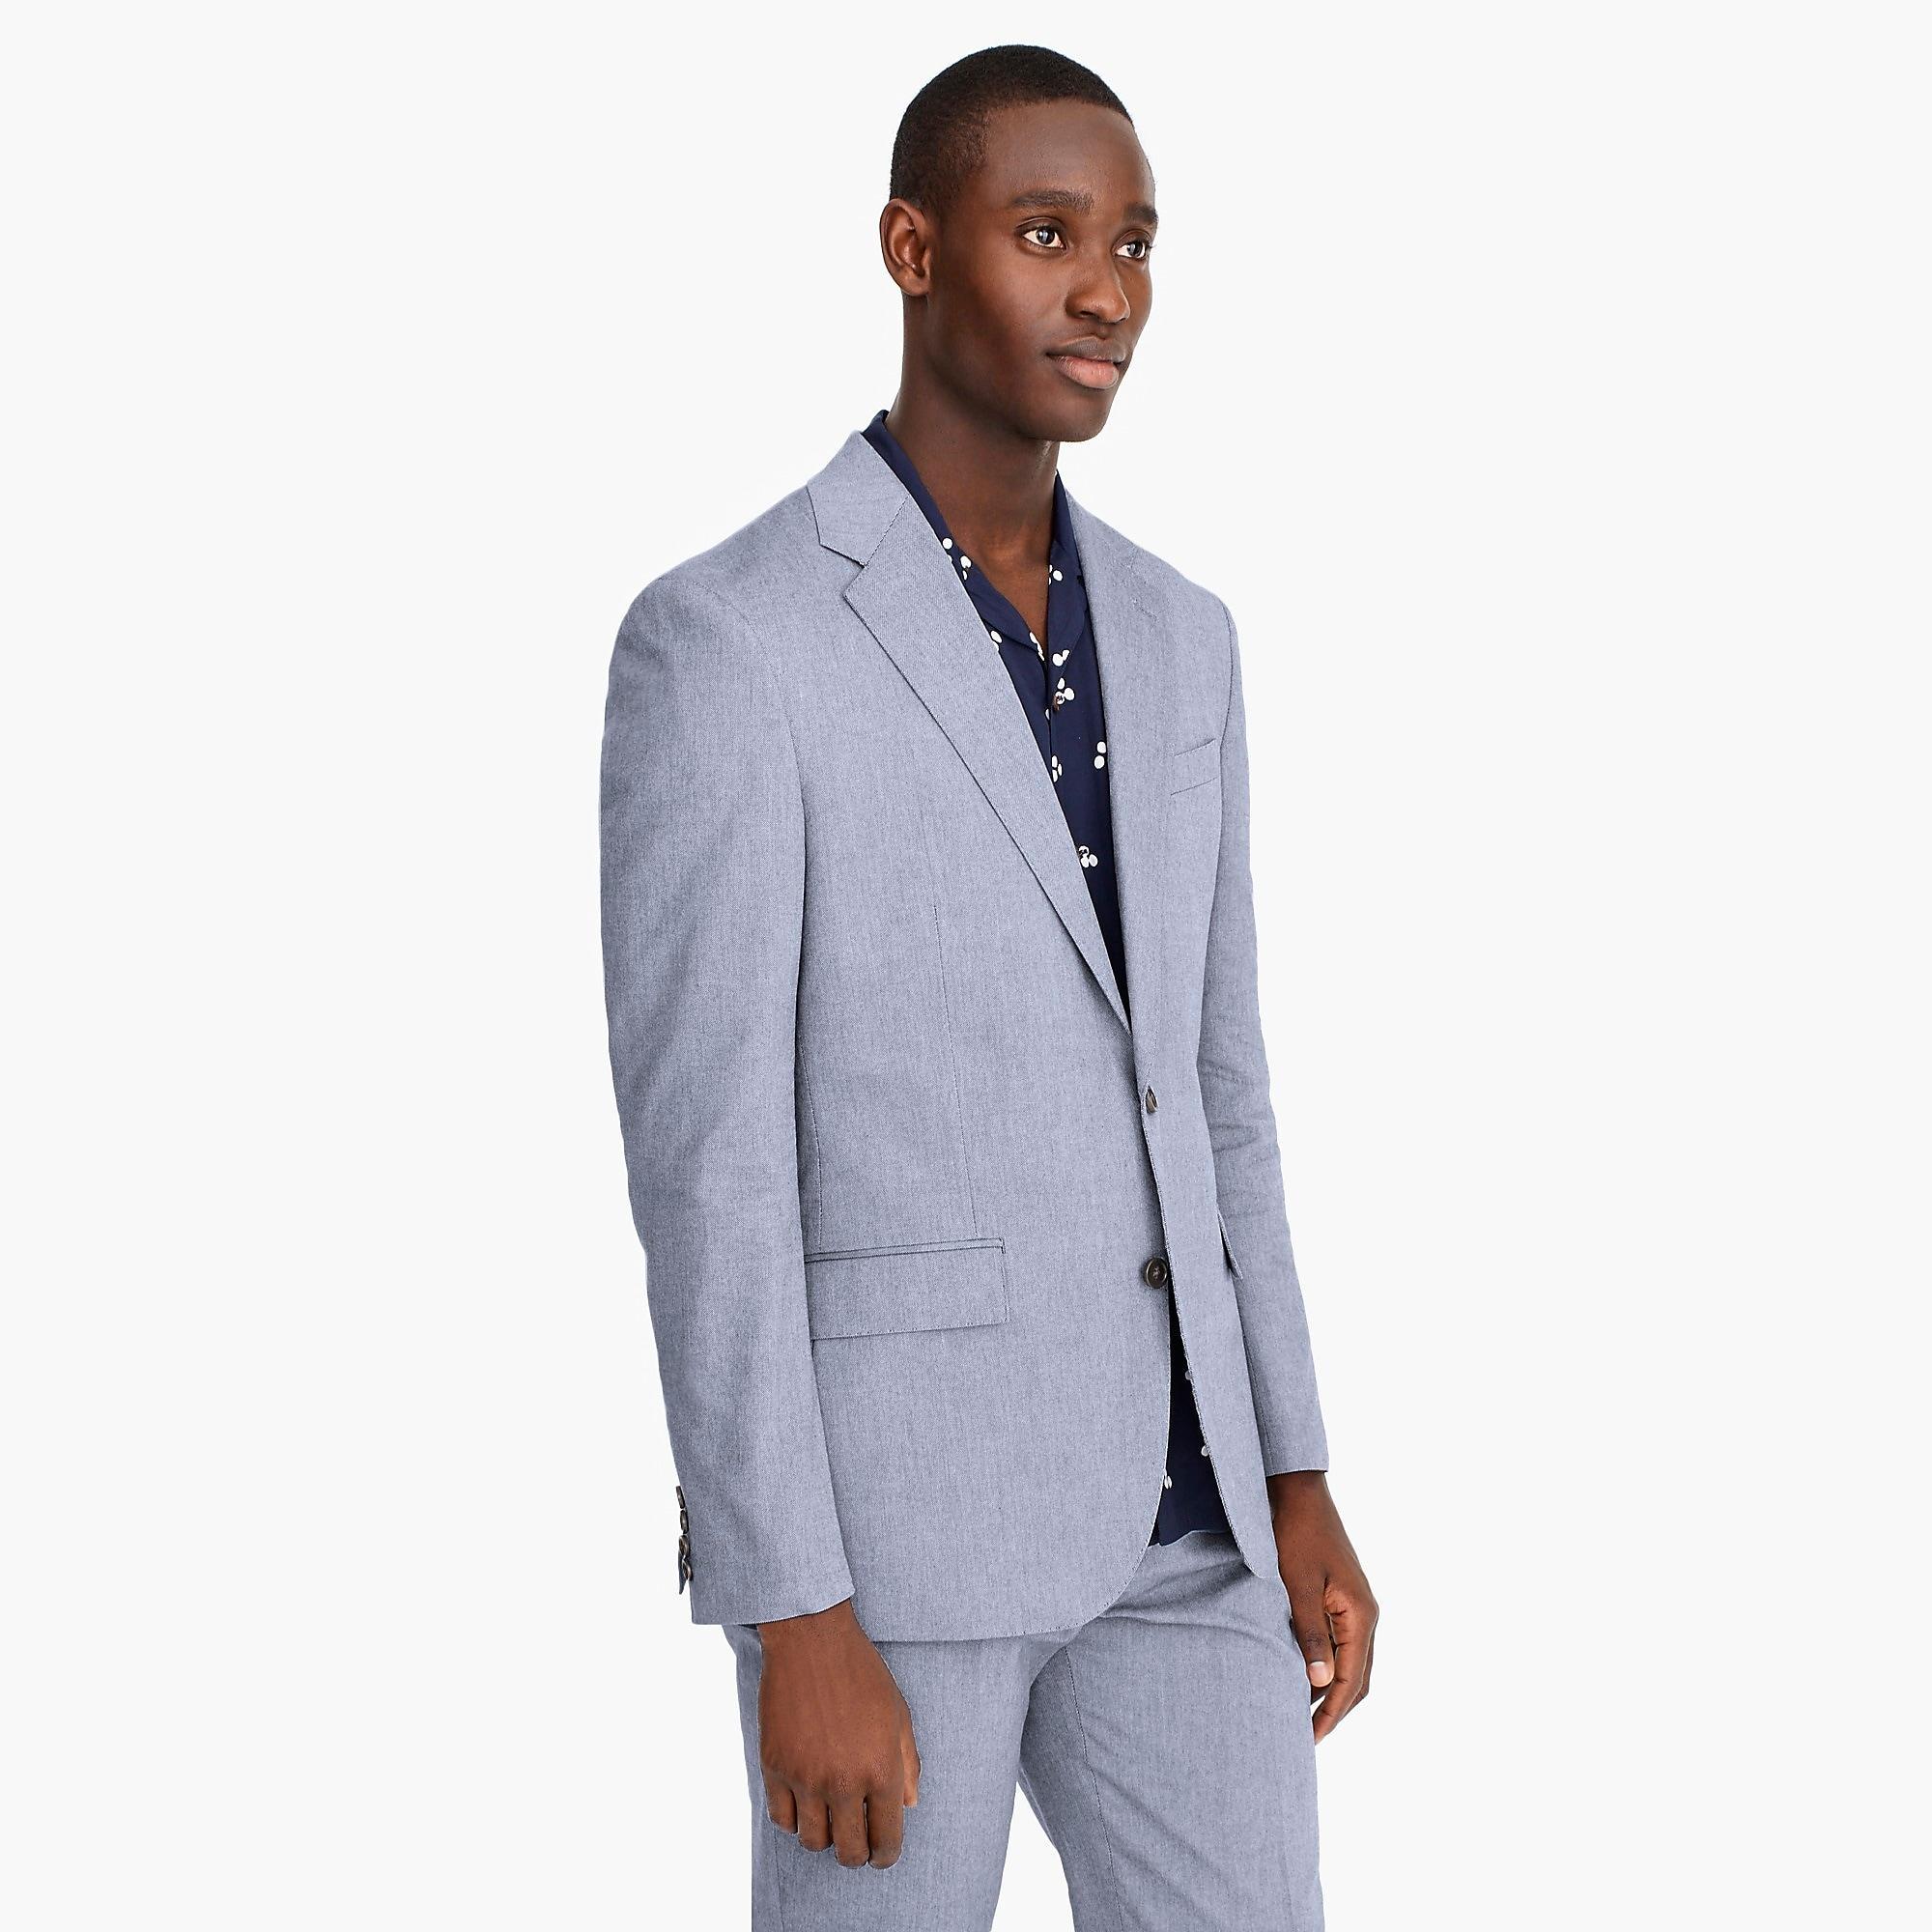 e19c44f482c4 ... Ludlow Classic-fit Suit Jacket In Union Blue Italian Cotton Oxford.  View fullscreen